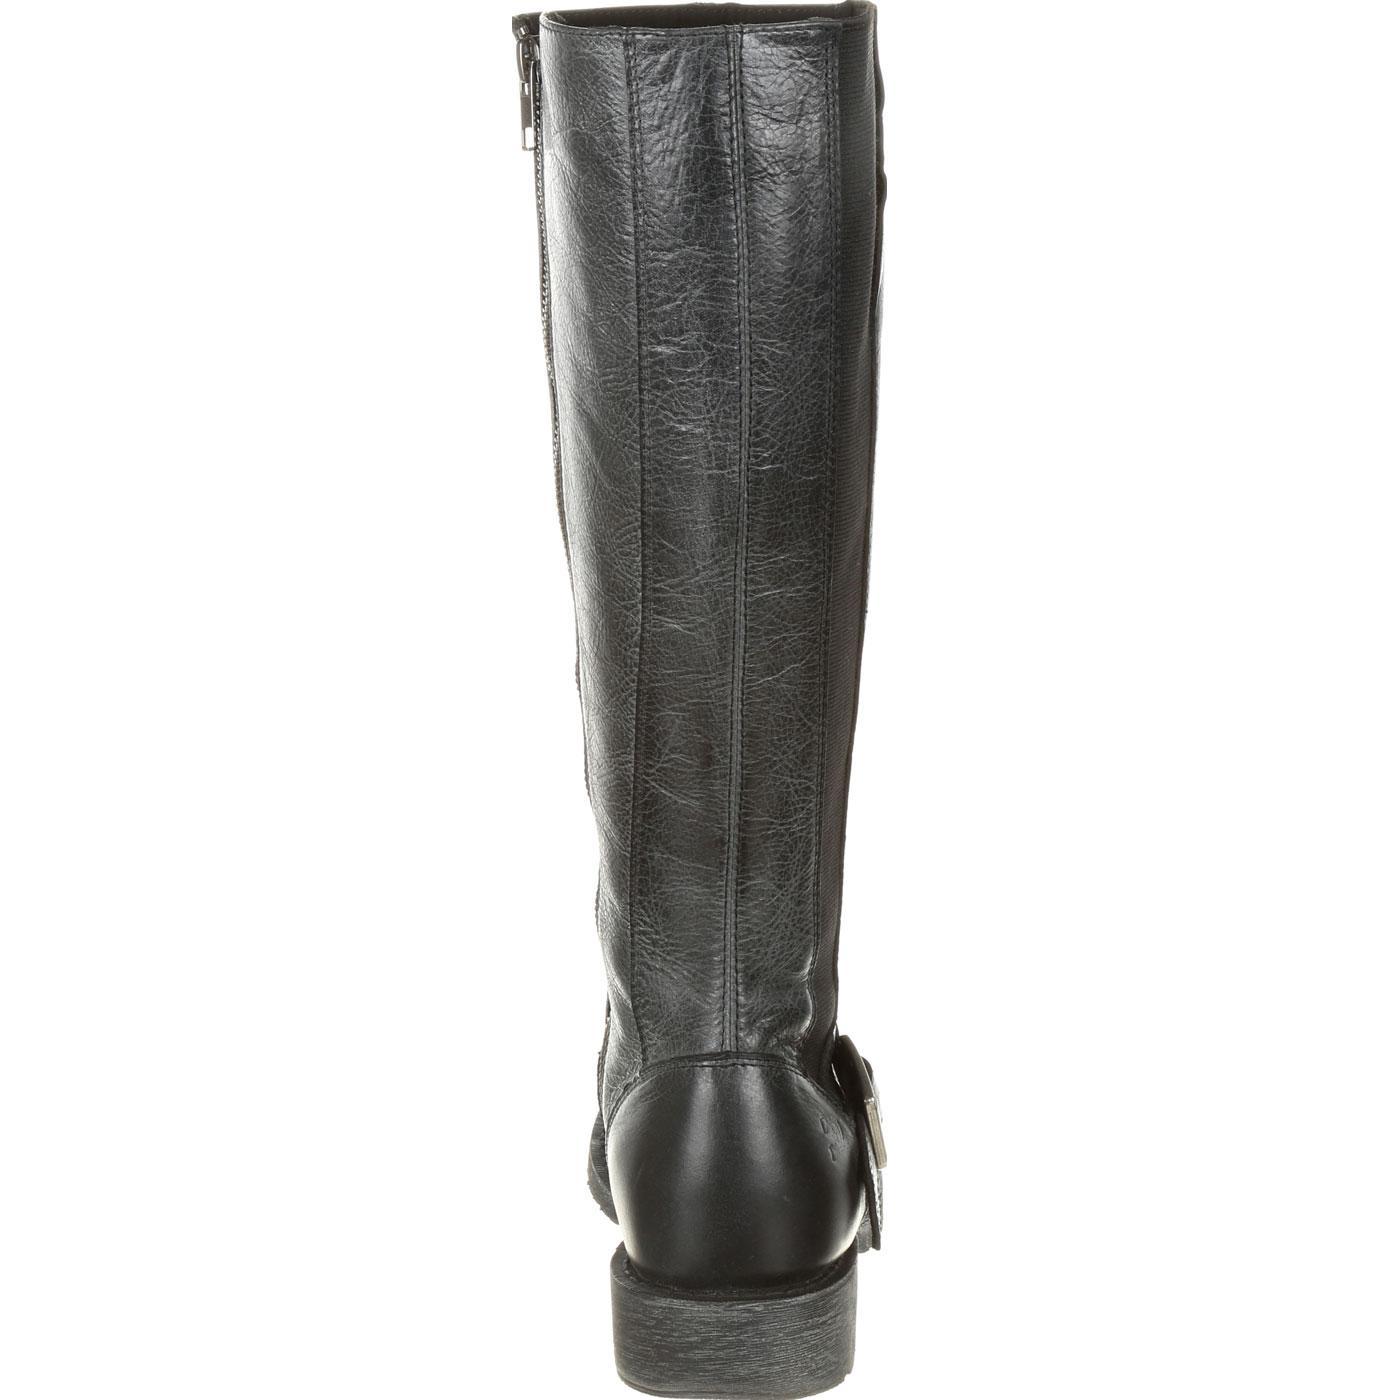 3a413e0aa #DRD0304, Crush by Durango Women's Black Riding Boot